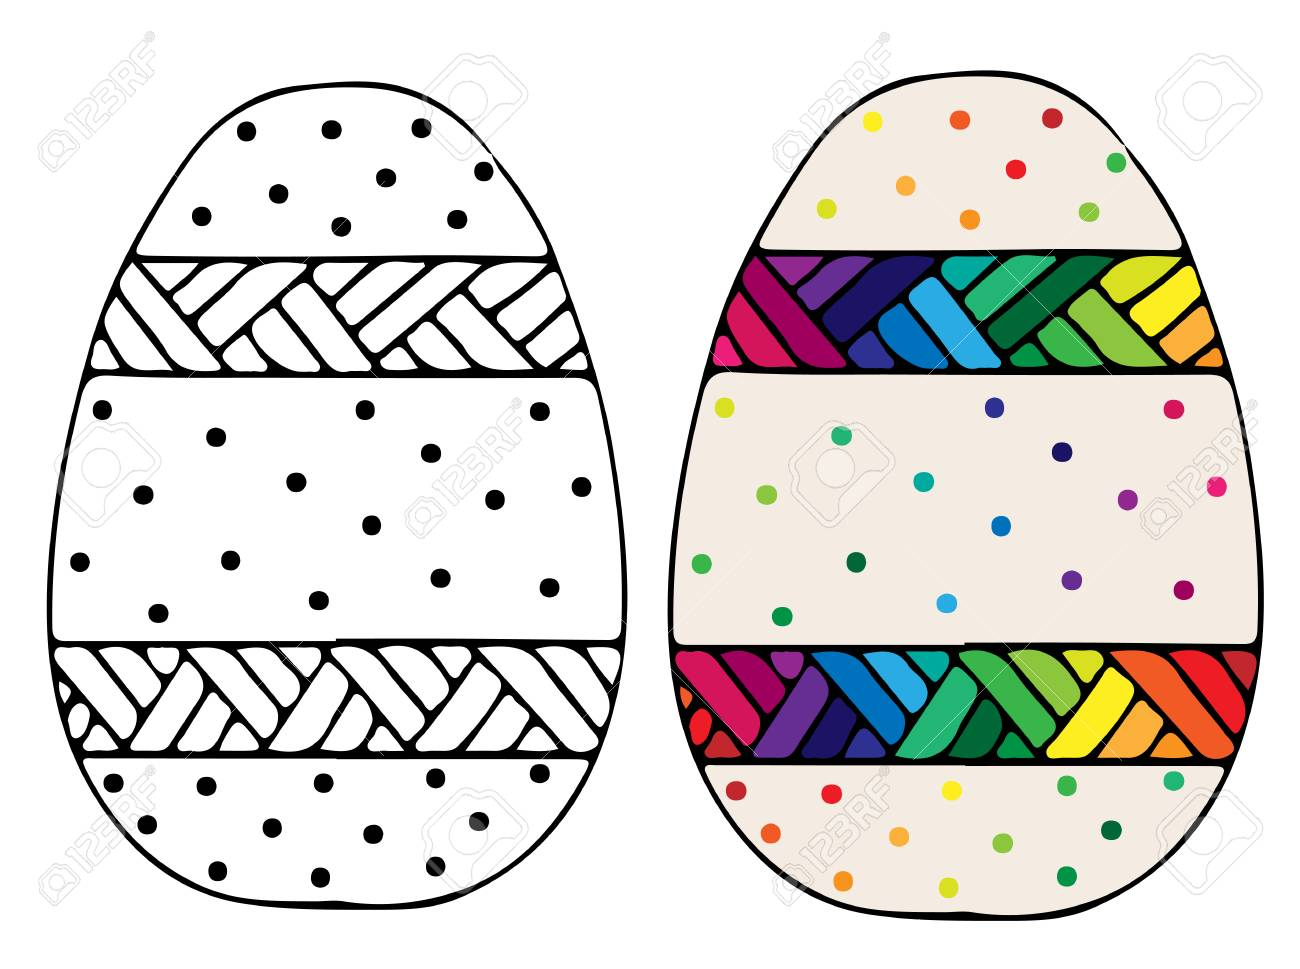 Dibujado A Mano Lindo Huevo De Pascua Con Patrón Abstracto Para ...